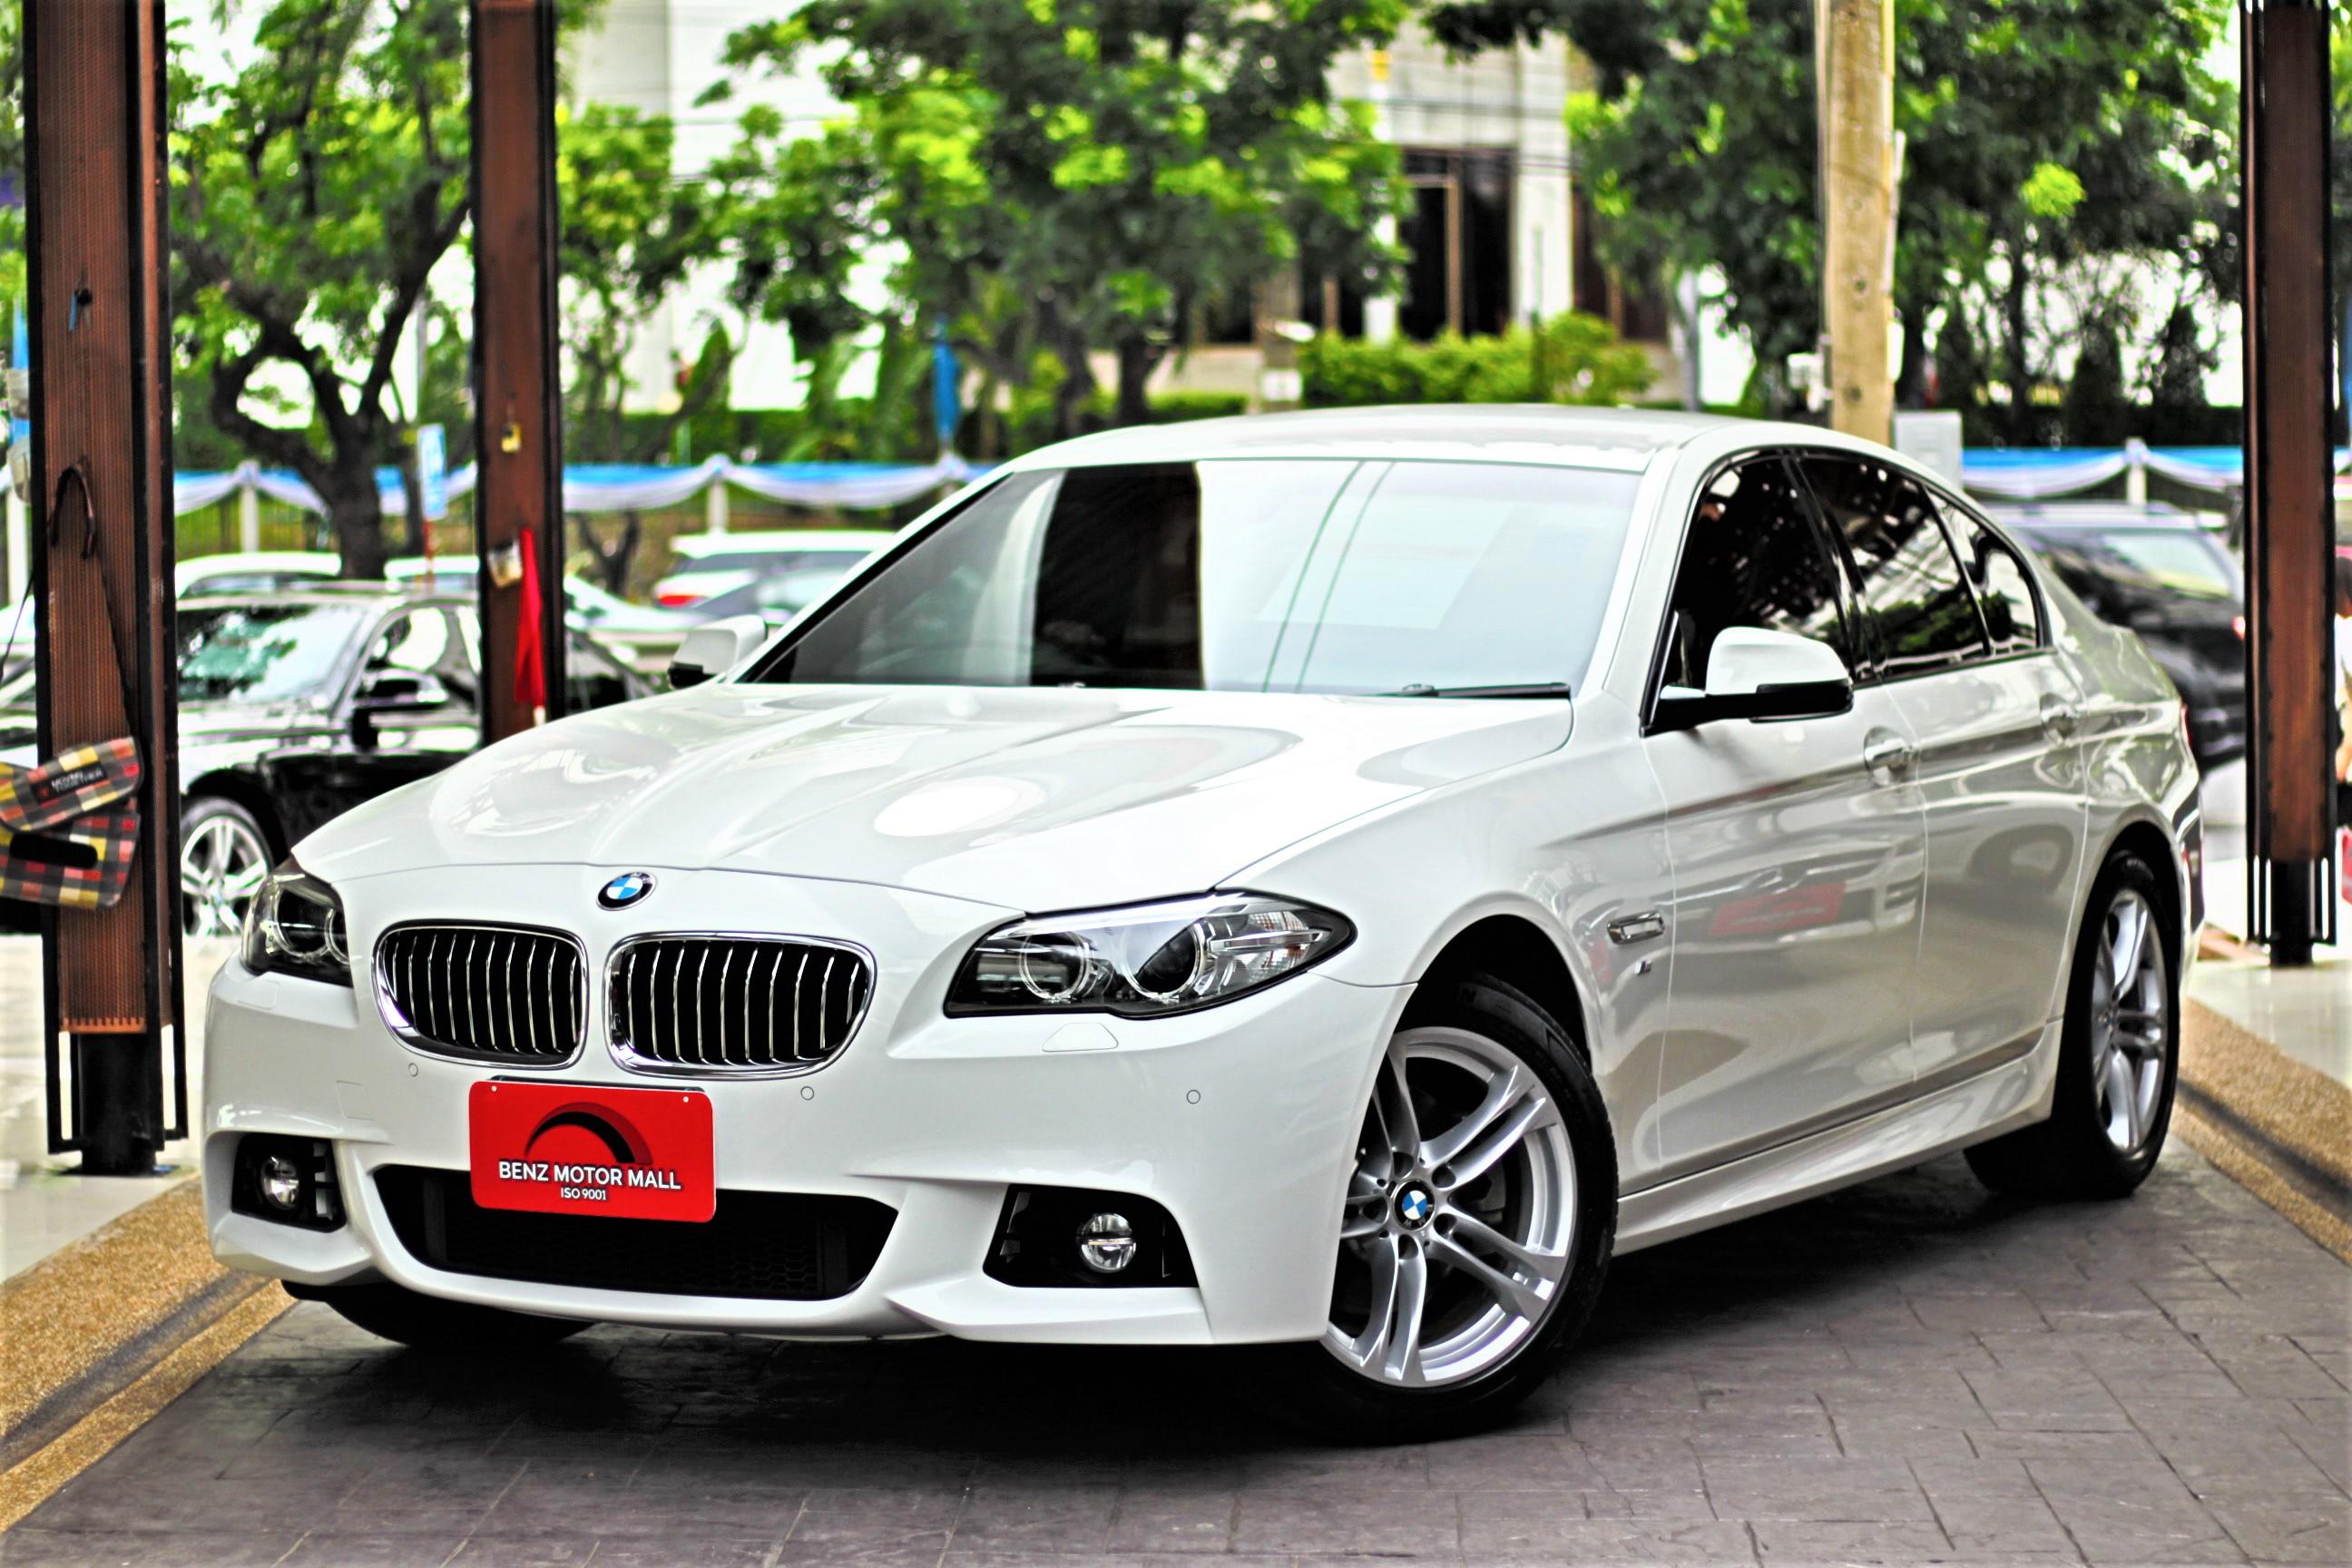 BMW 520d M-Sport ปี 17 รหัส #978